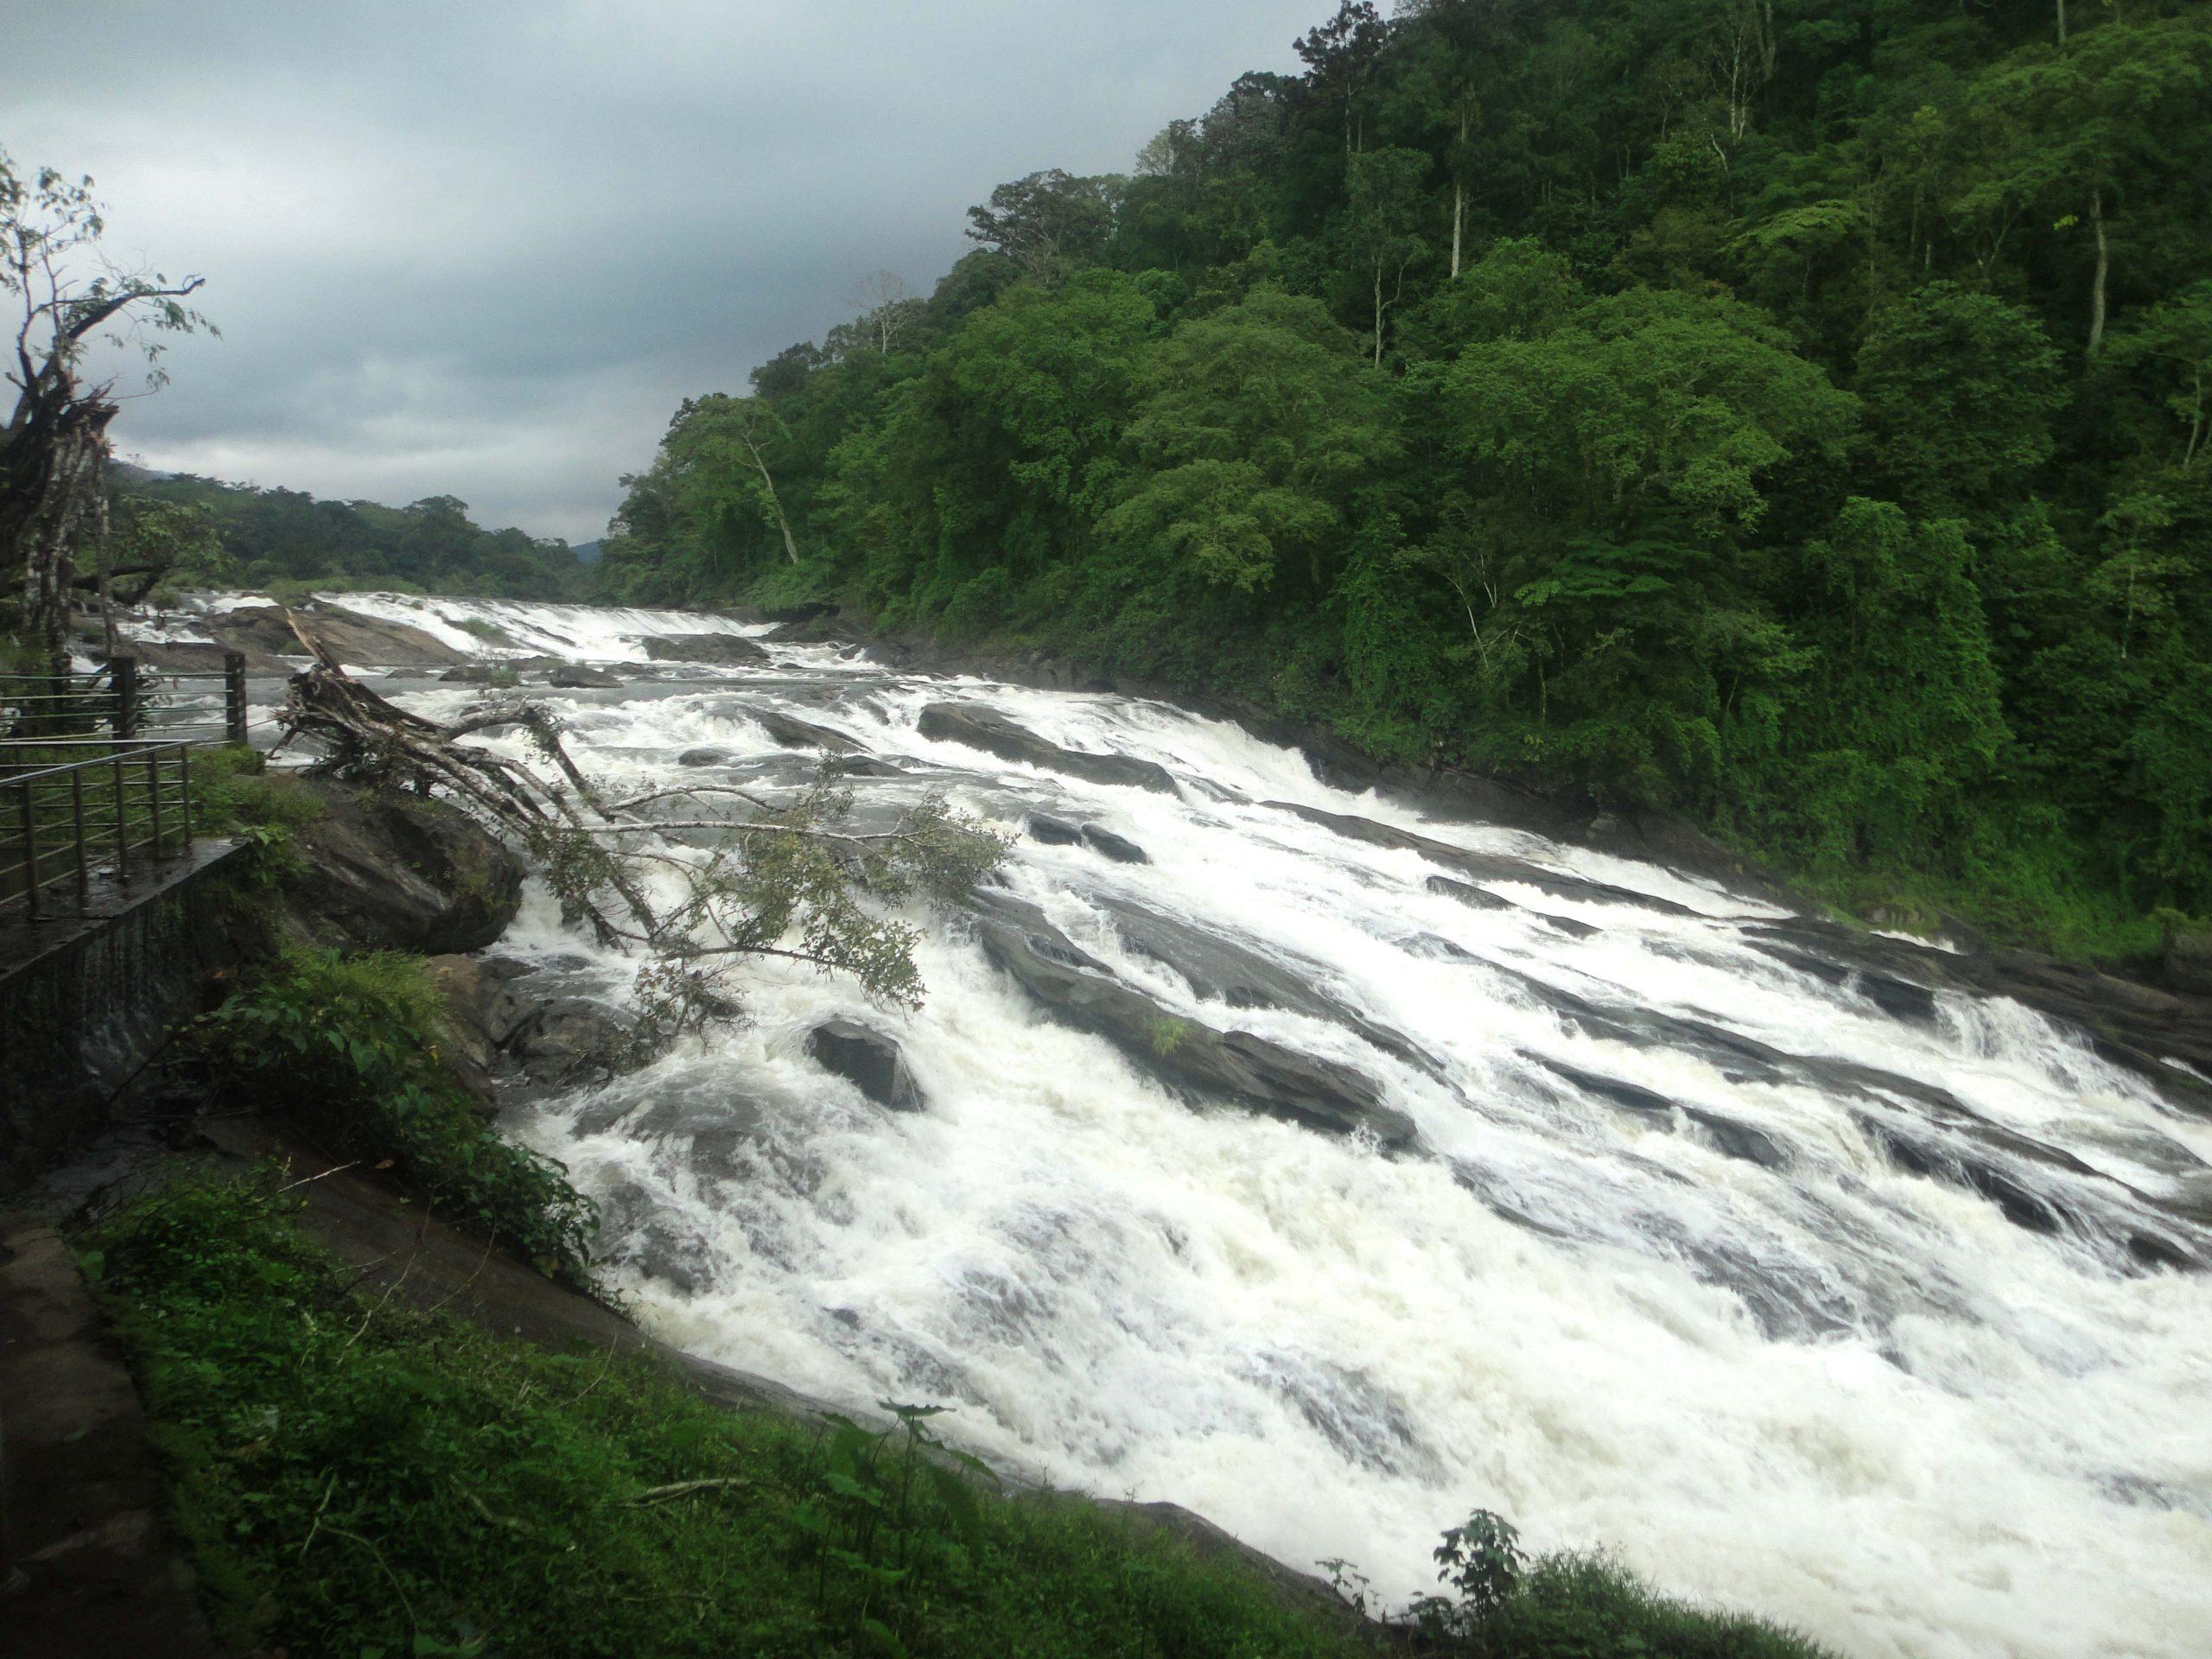 Chunchanakatte Falls Must Visit When In Mysore